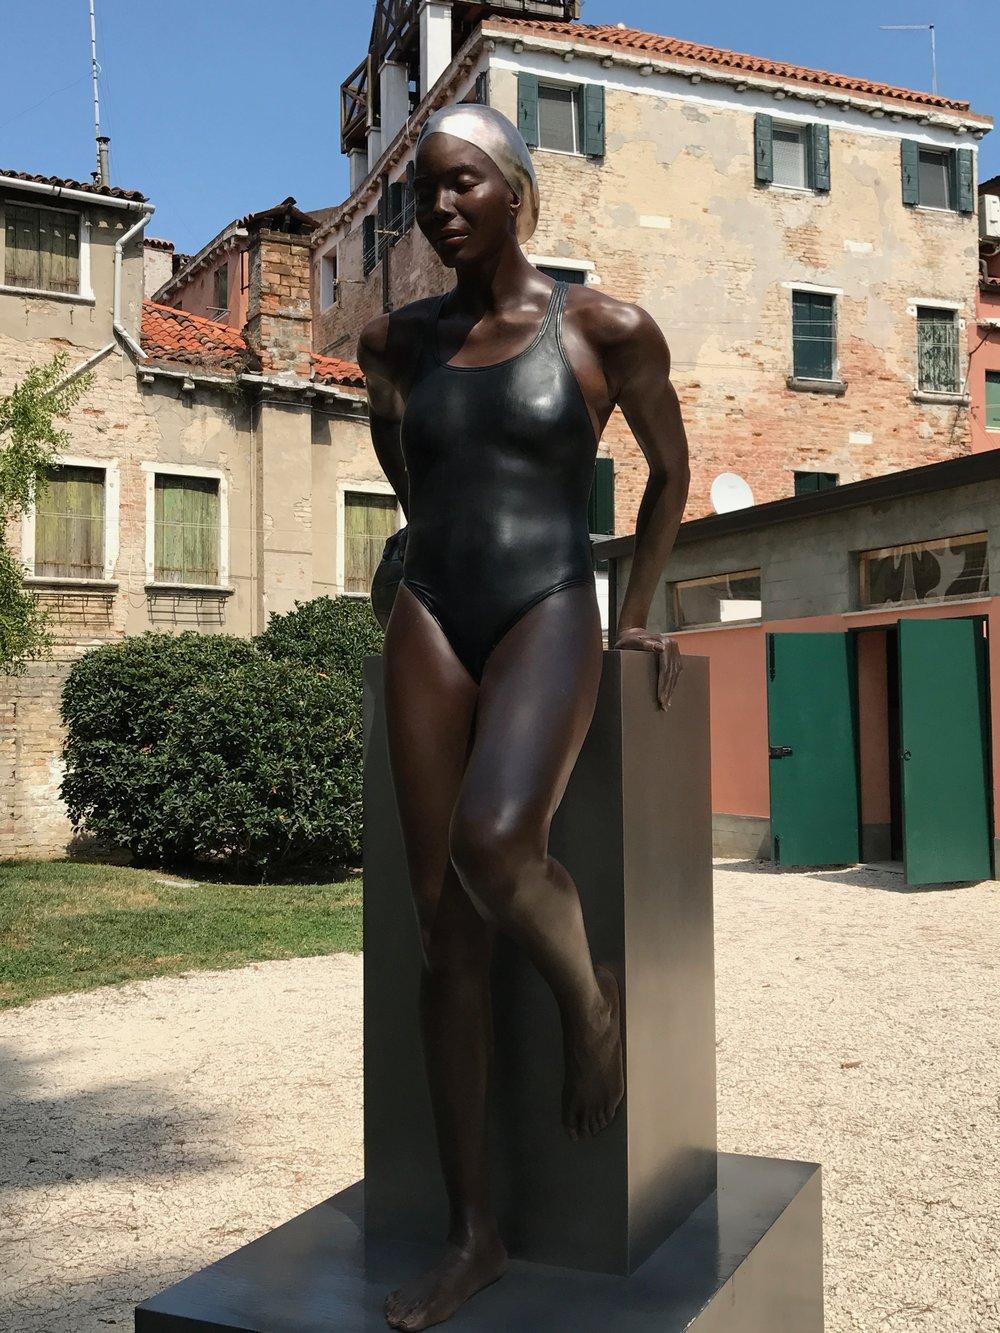 Yaima & The Ball, Bronze, 70 x 28 x 39, 2016, Giardini Marineressa, Venice, Italy